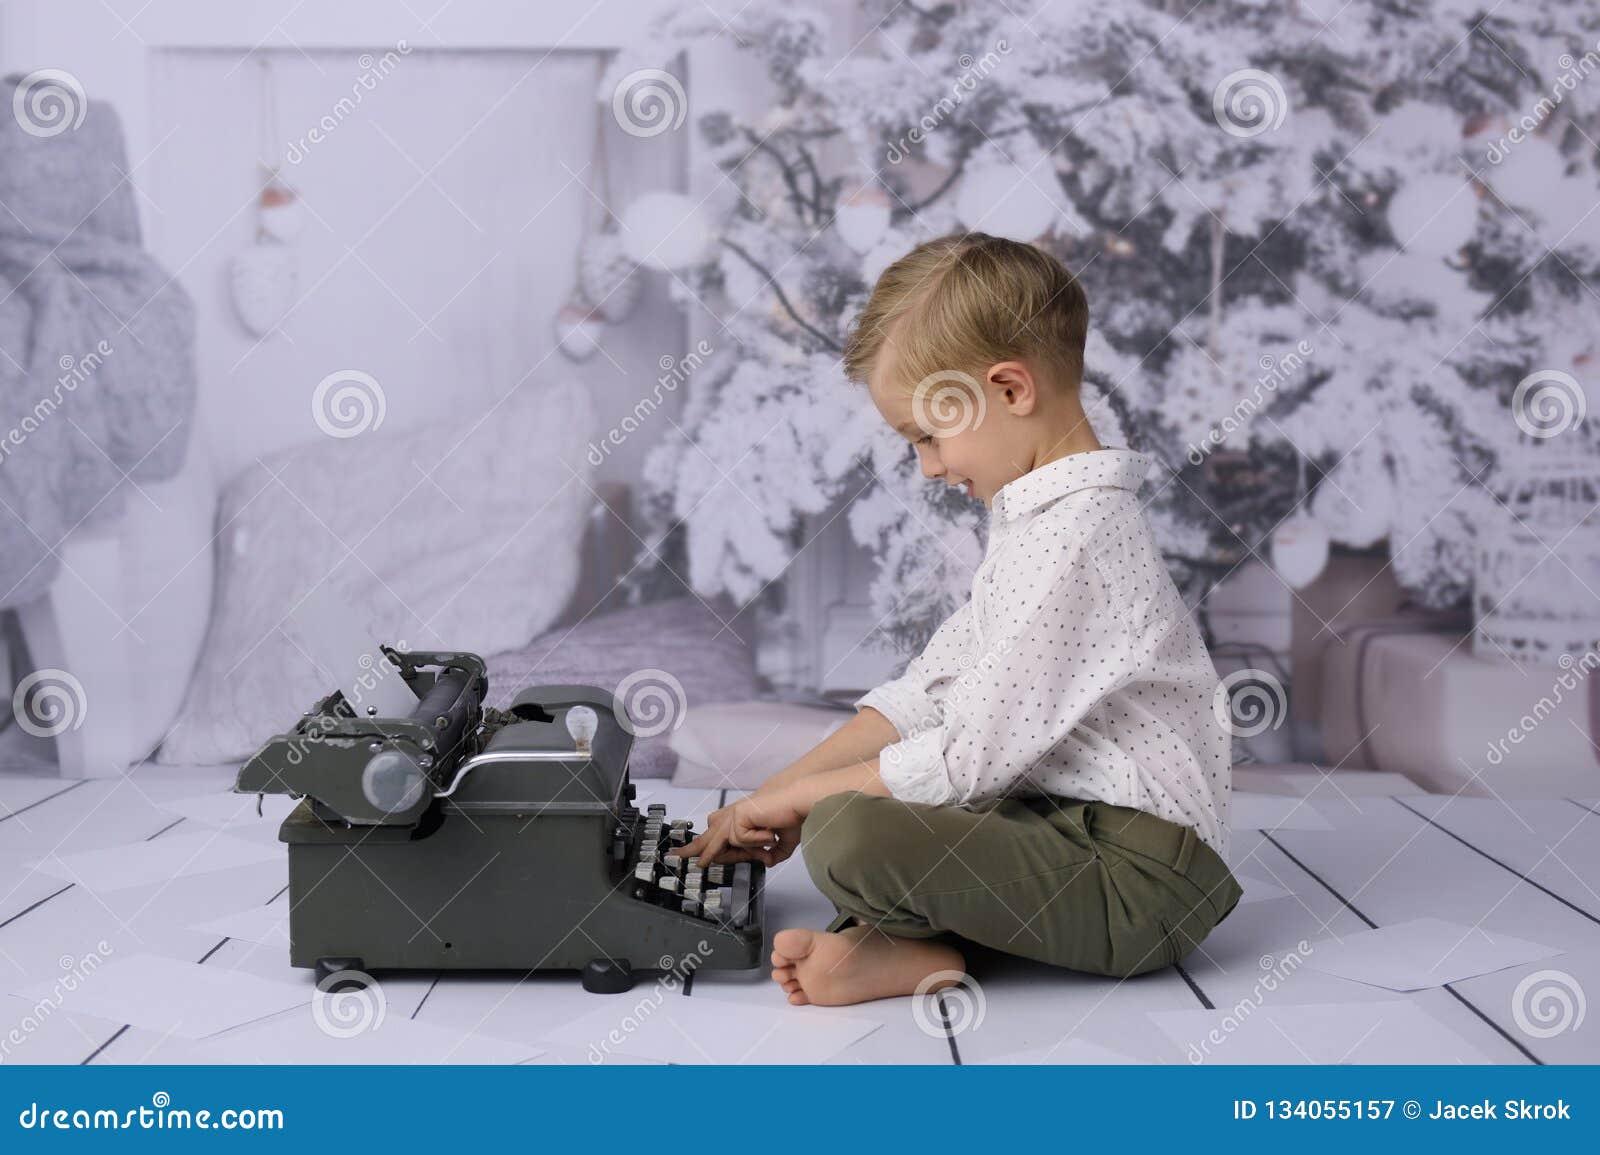 Santa επιστολών Claus santa επιστολών Claus Ένα ευτυχές παιδί γράφει έναν κατάλογο δώρων